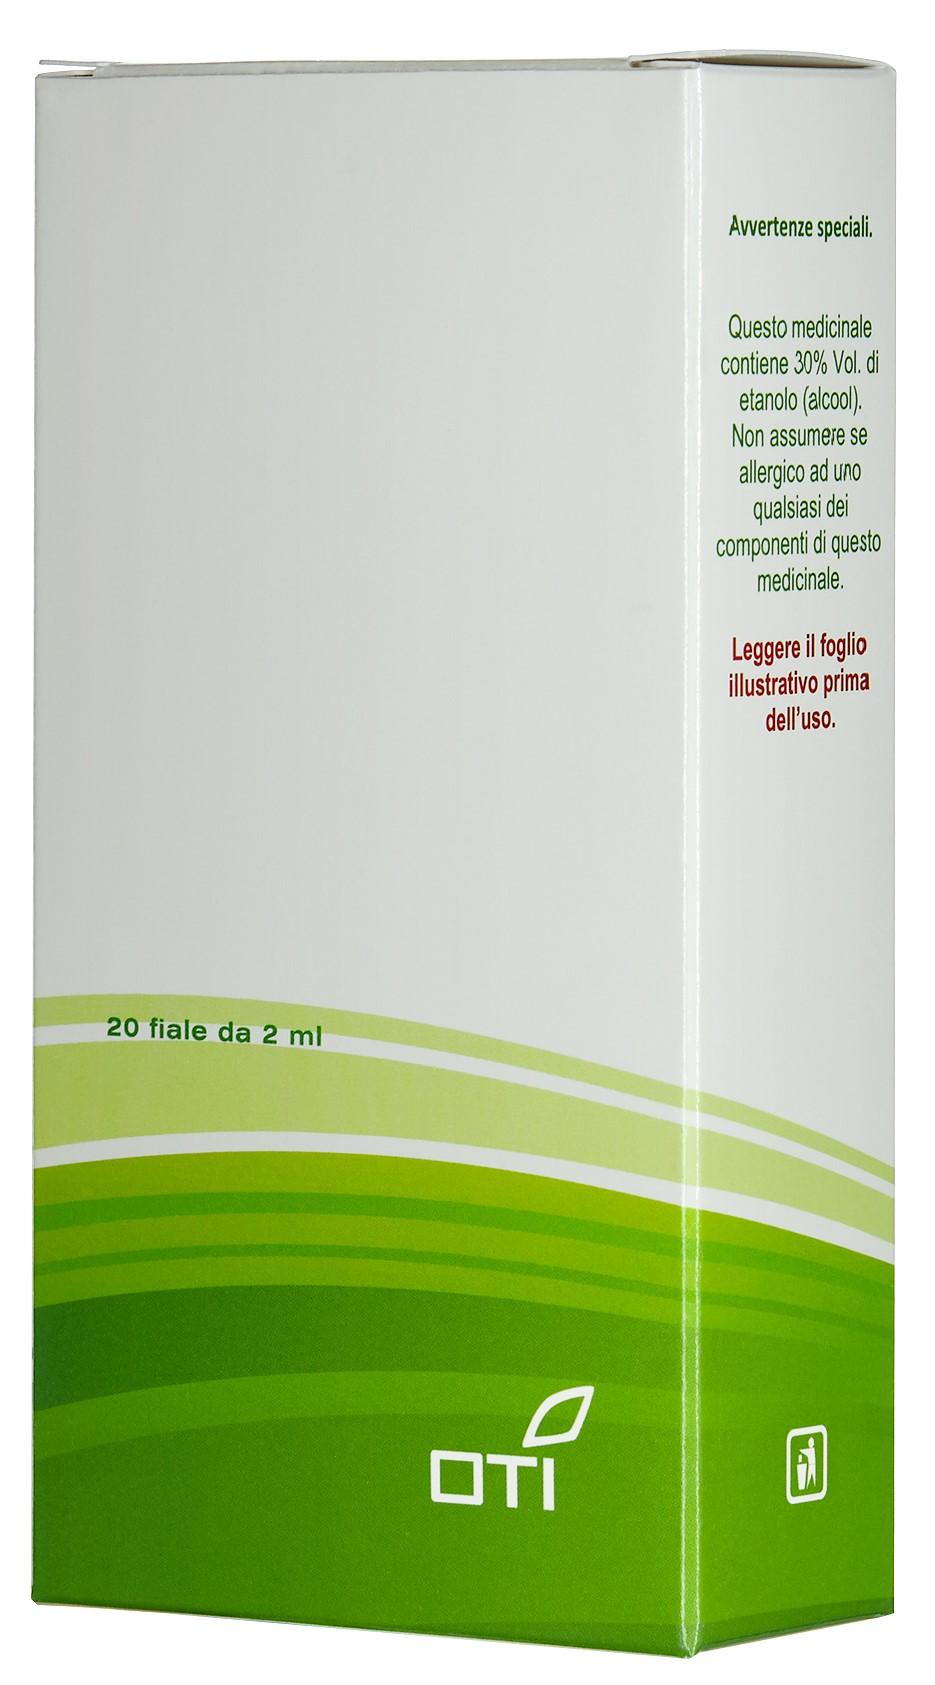 ANTI CD 44*06LM PL 20F 2ML - Parafarmaciaigiardini.it